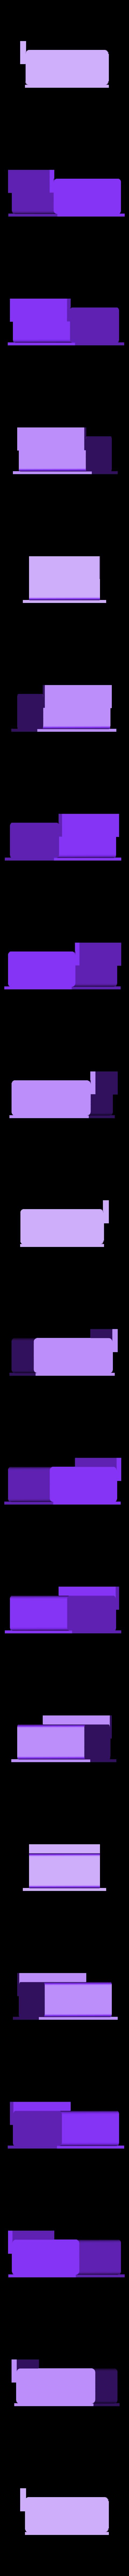 G bidon2.STL Download STL file Draisine Matisa for LGB • 3D printable object, biddle